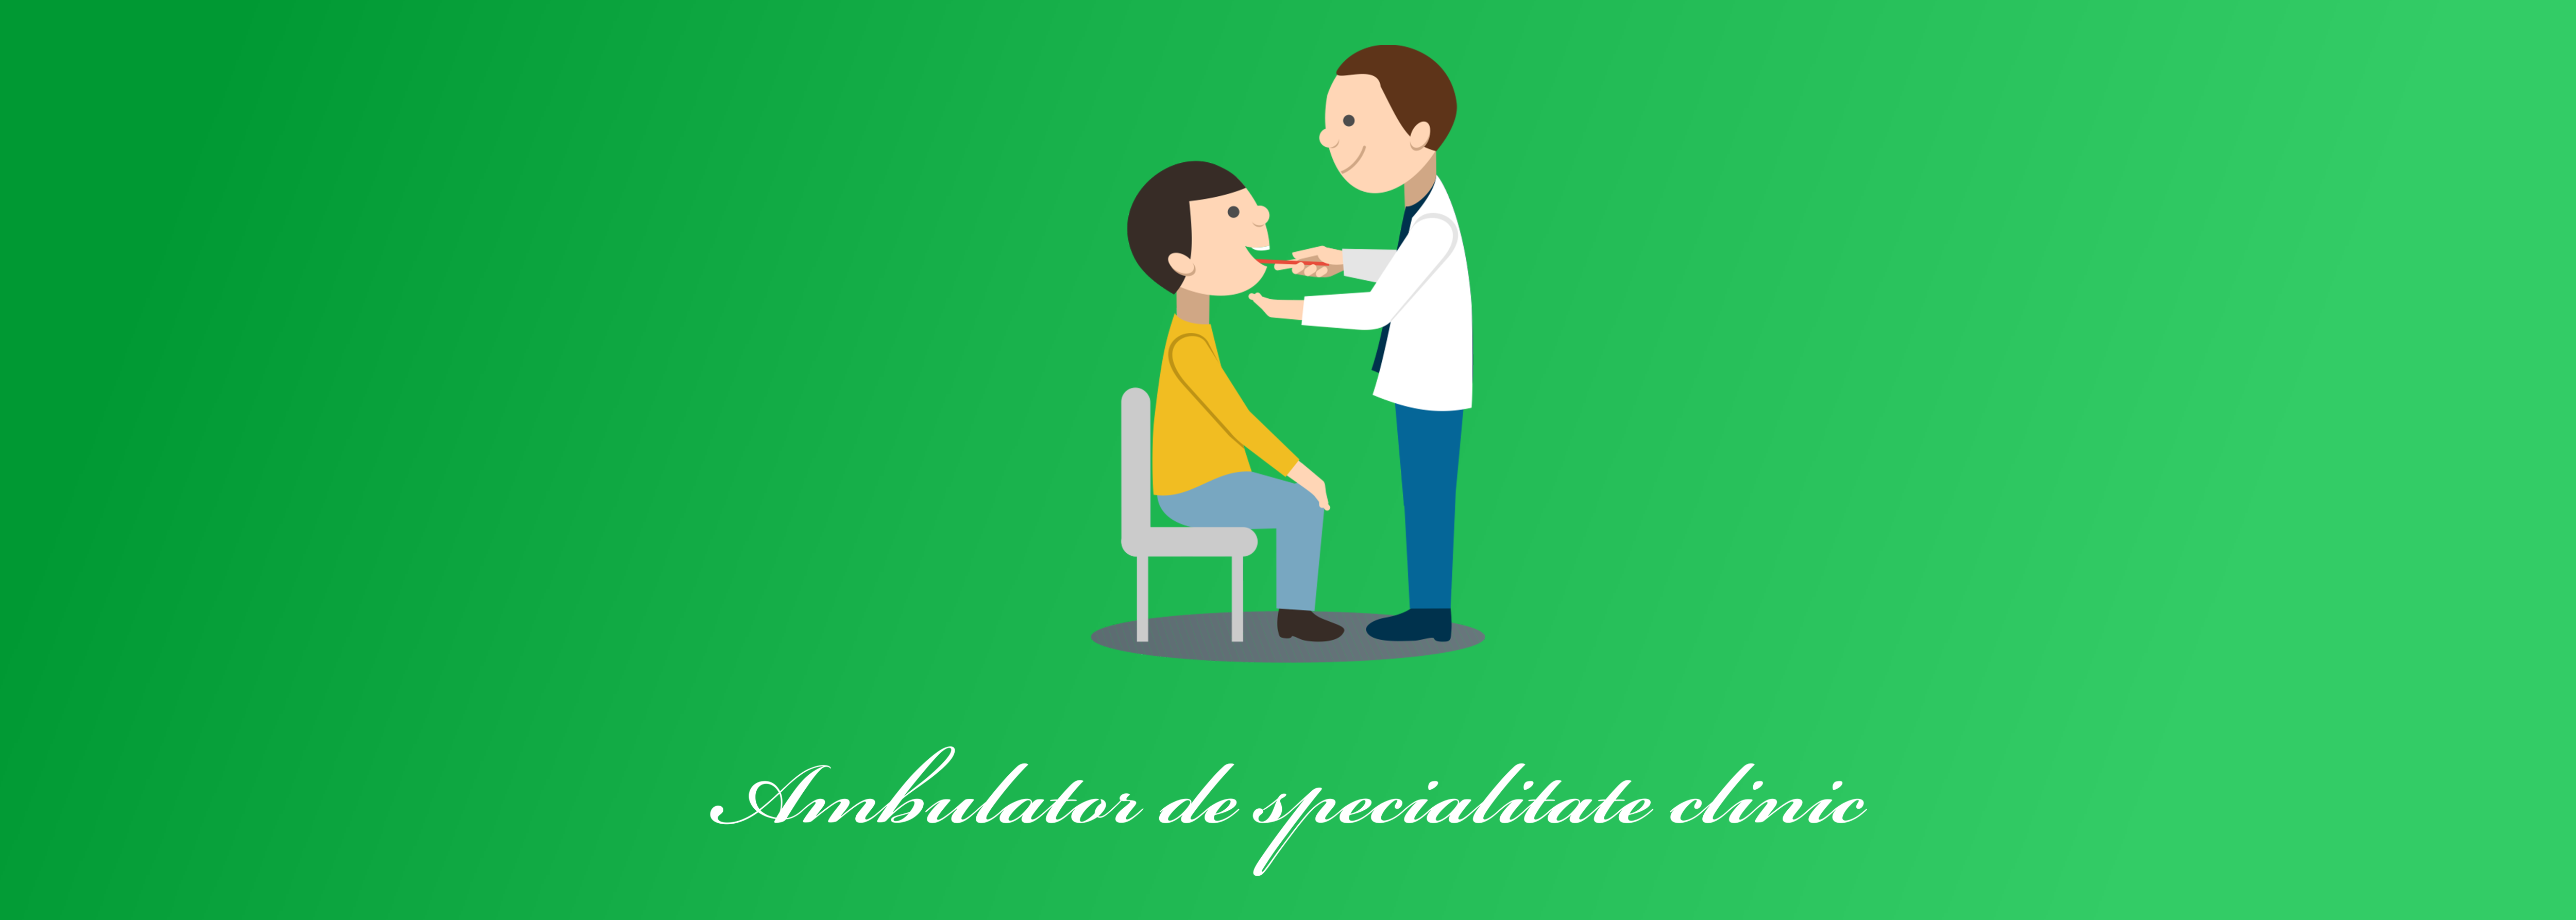 Ambulator clinic